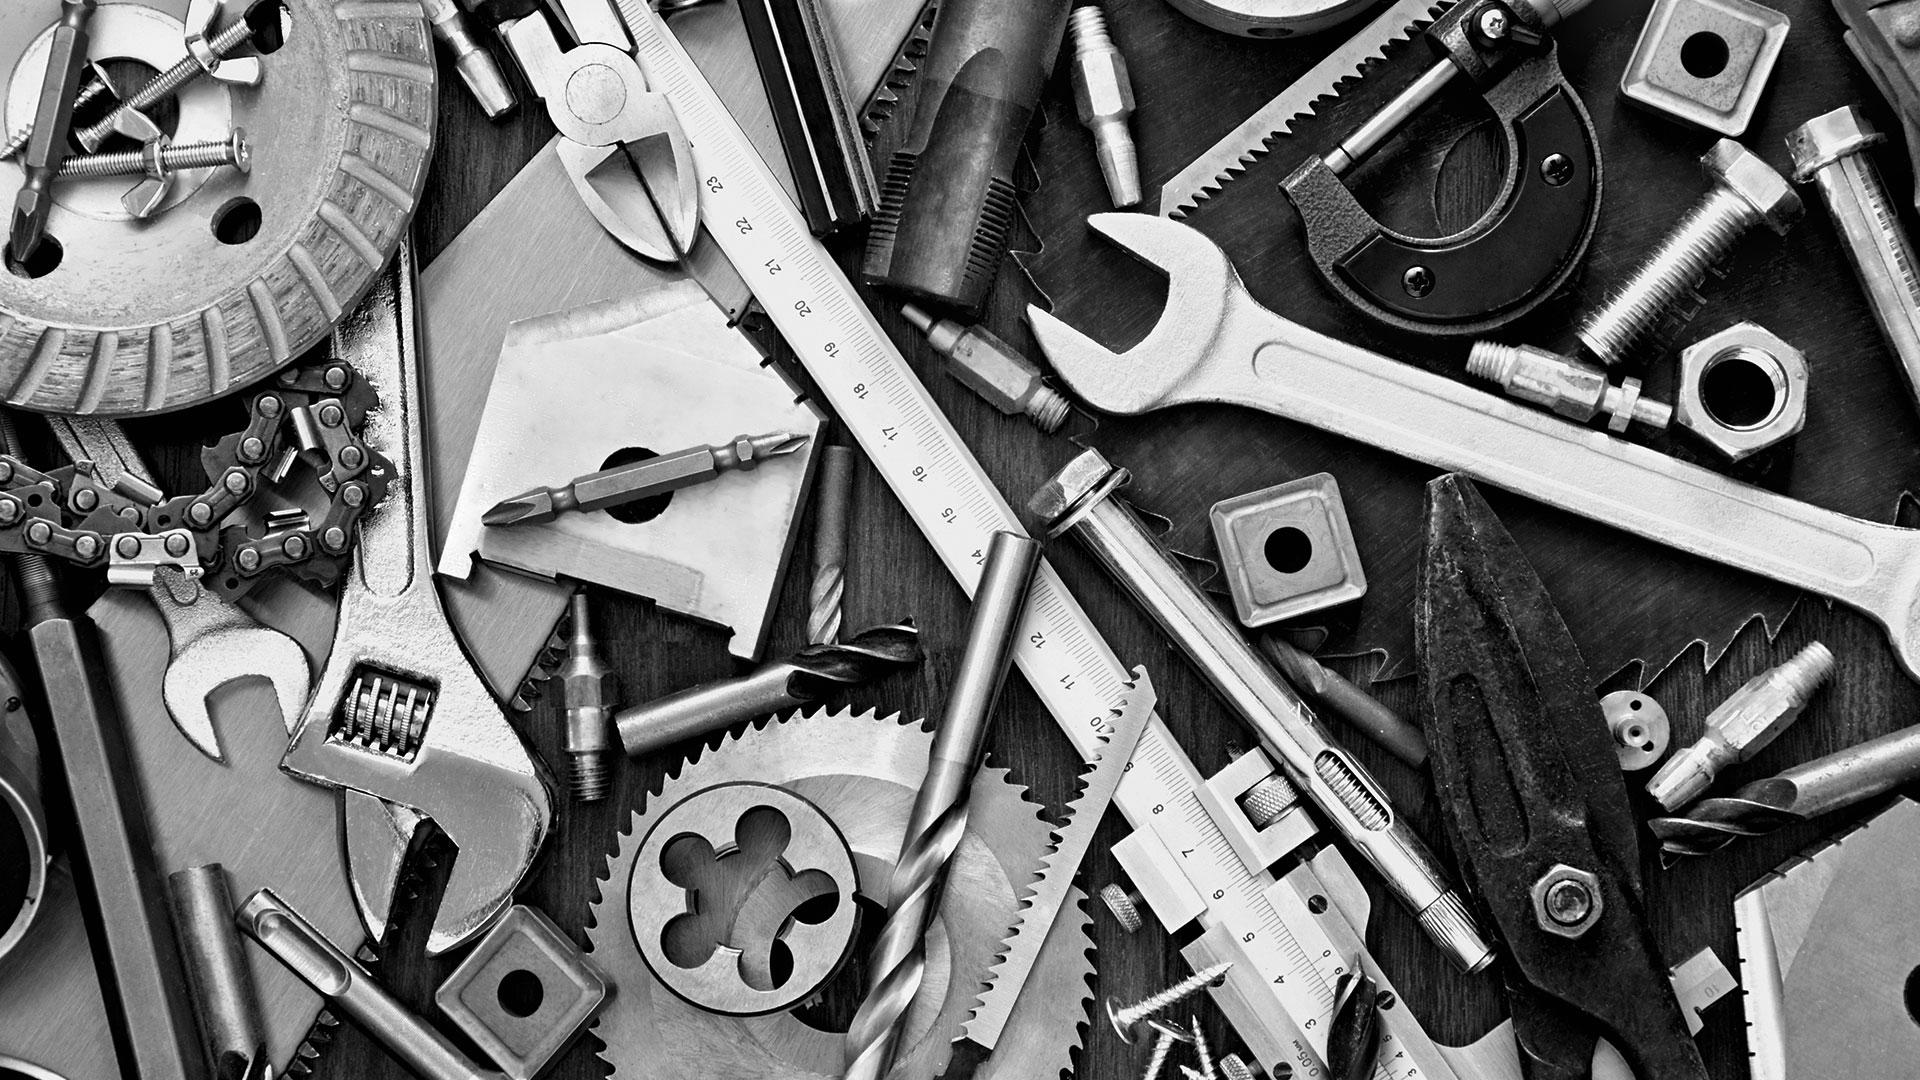 tools-toolbox-bw-ss-1920.jpg